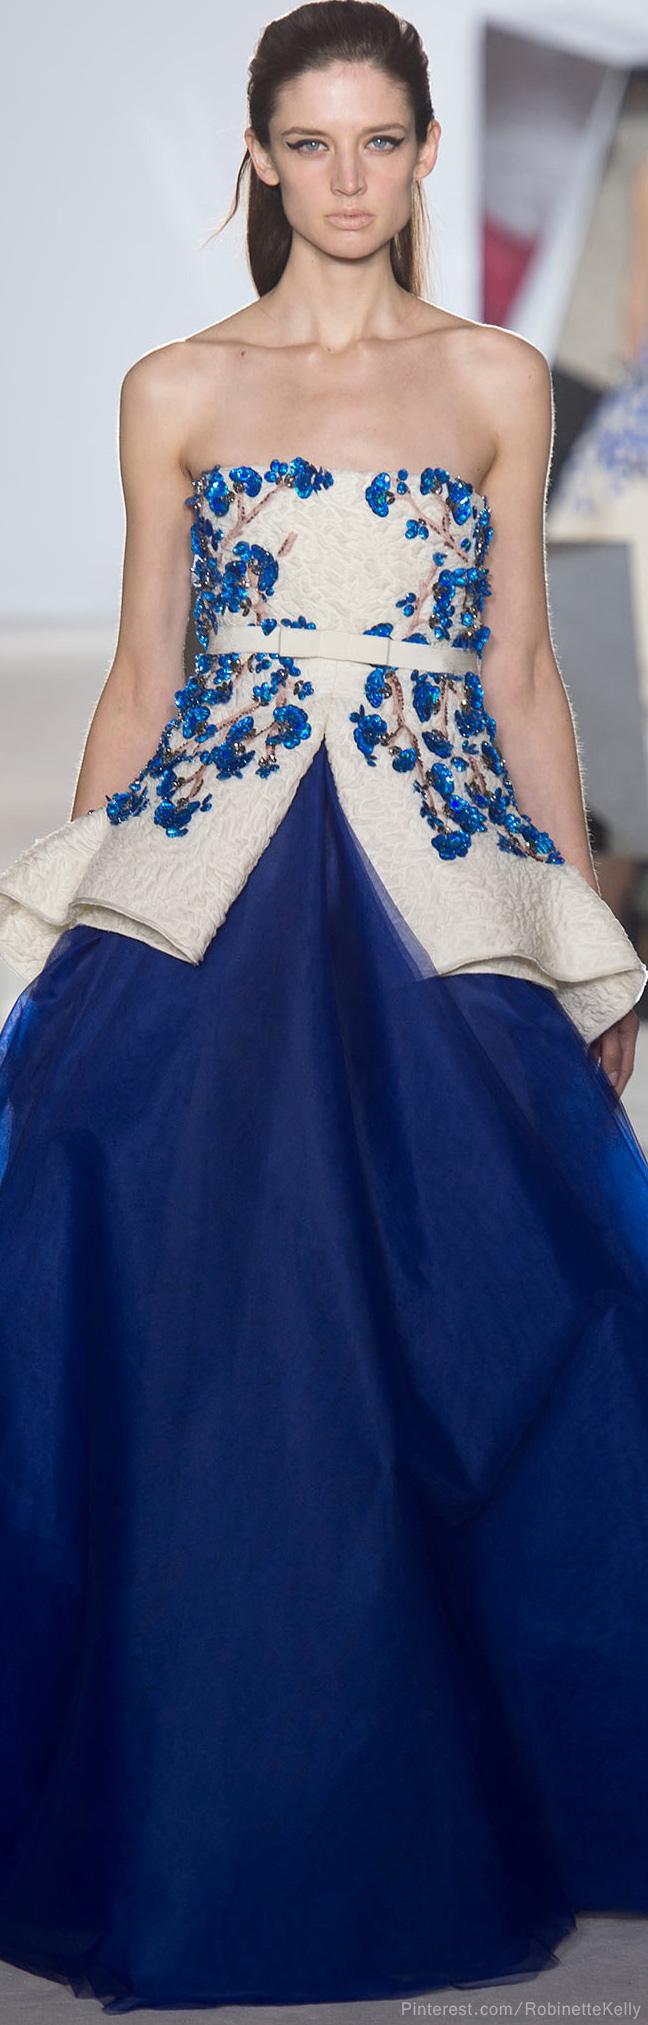 Giambattista Valli Haute Couture | S/S 2014